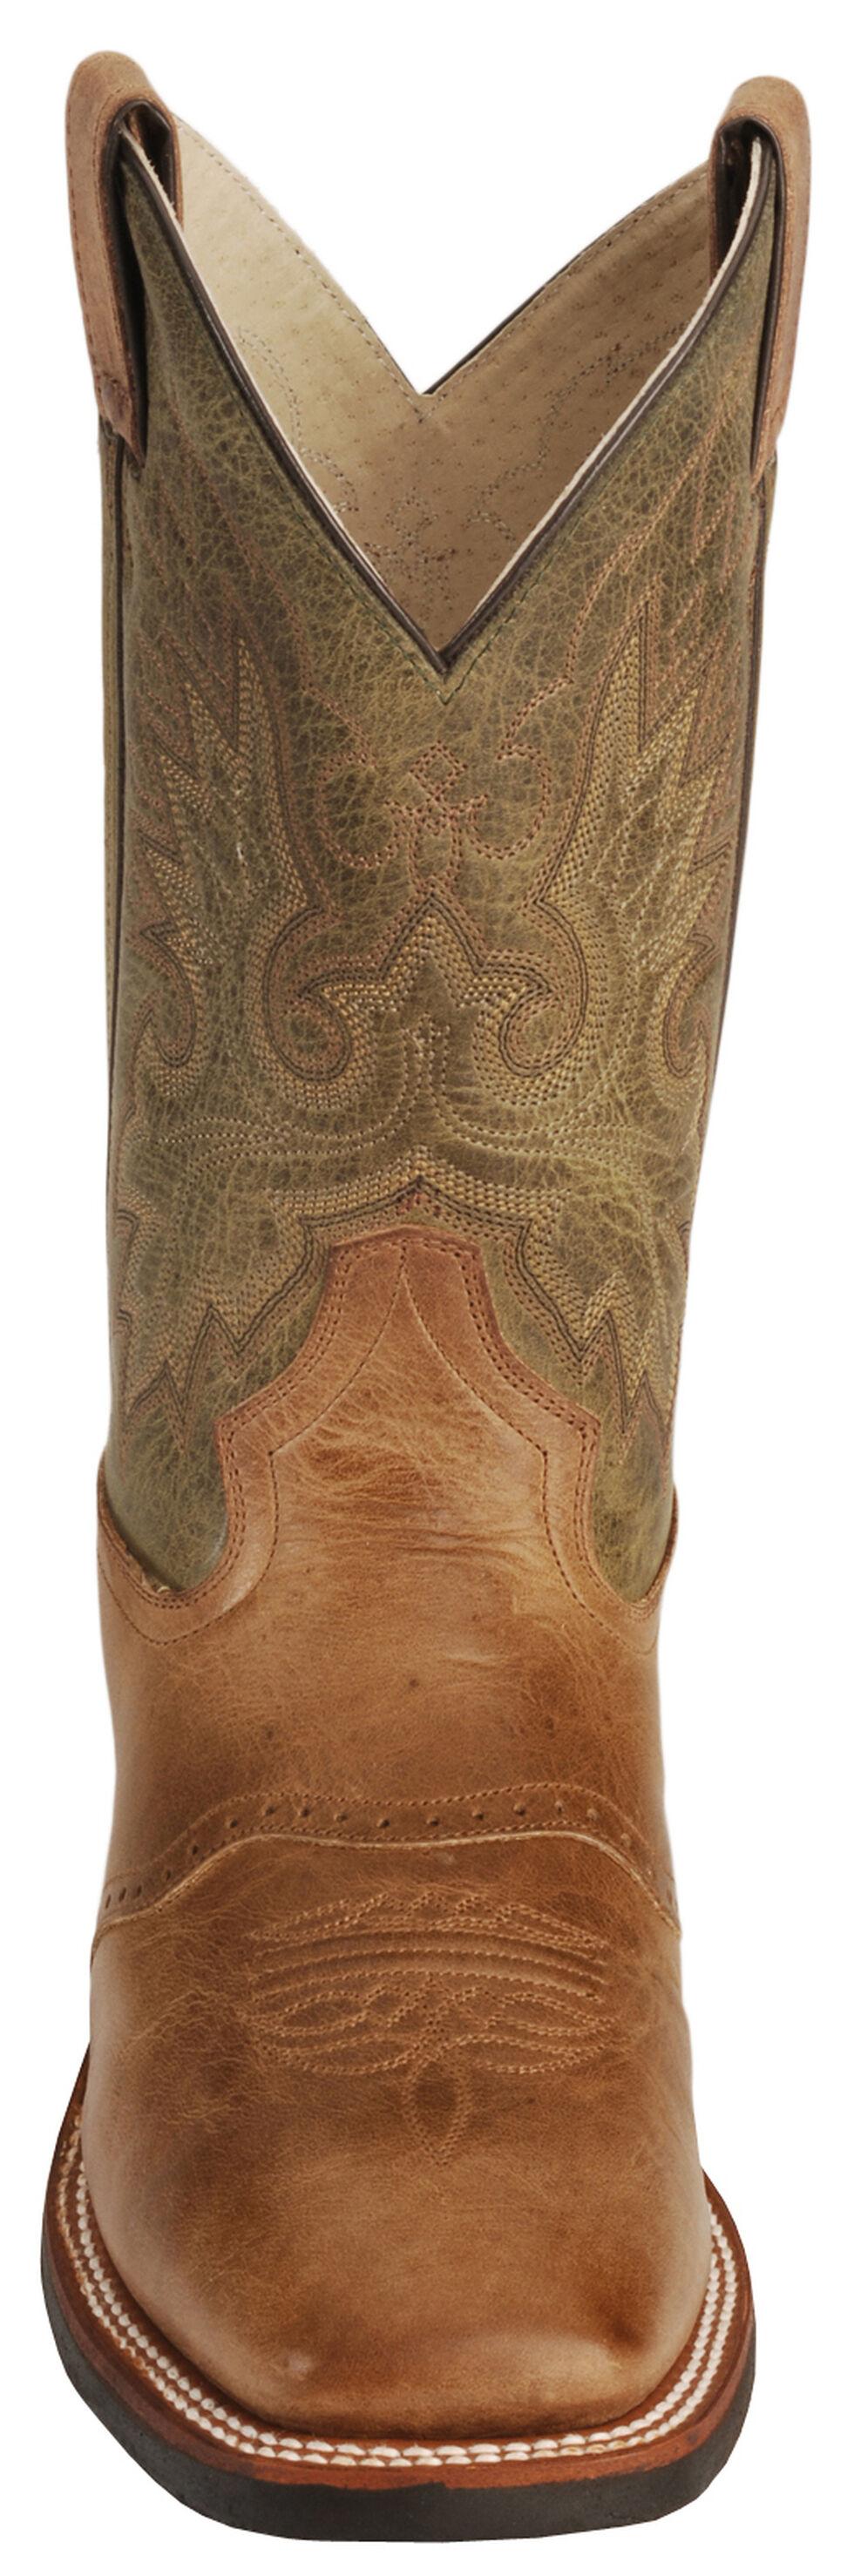 Double H Cognac Roper Cowboy Boots - Wide Square Toe, Cognac, hi-res